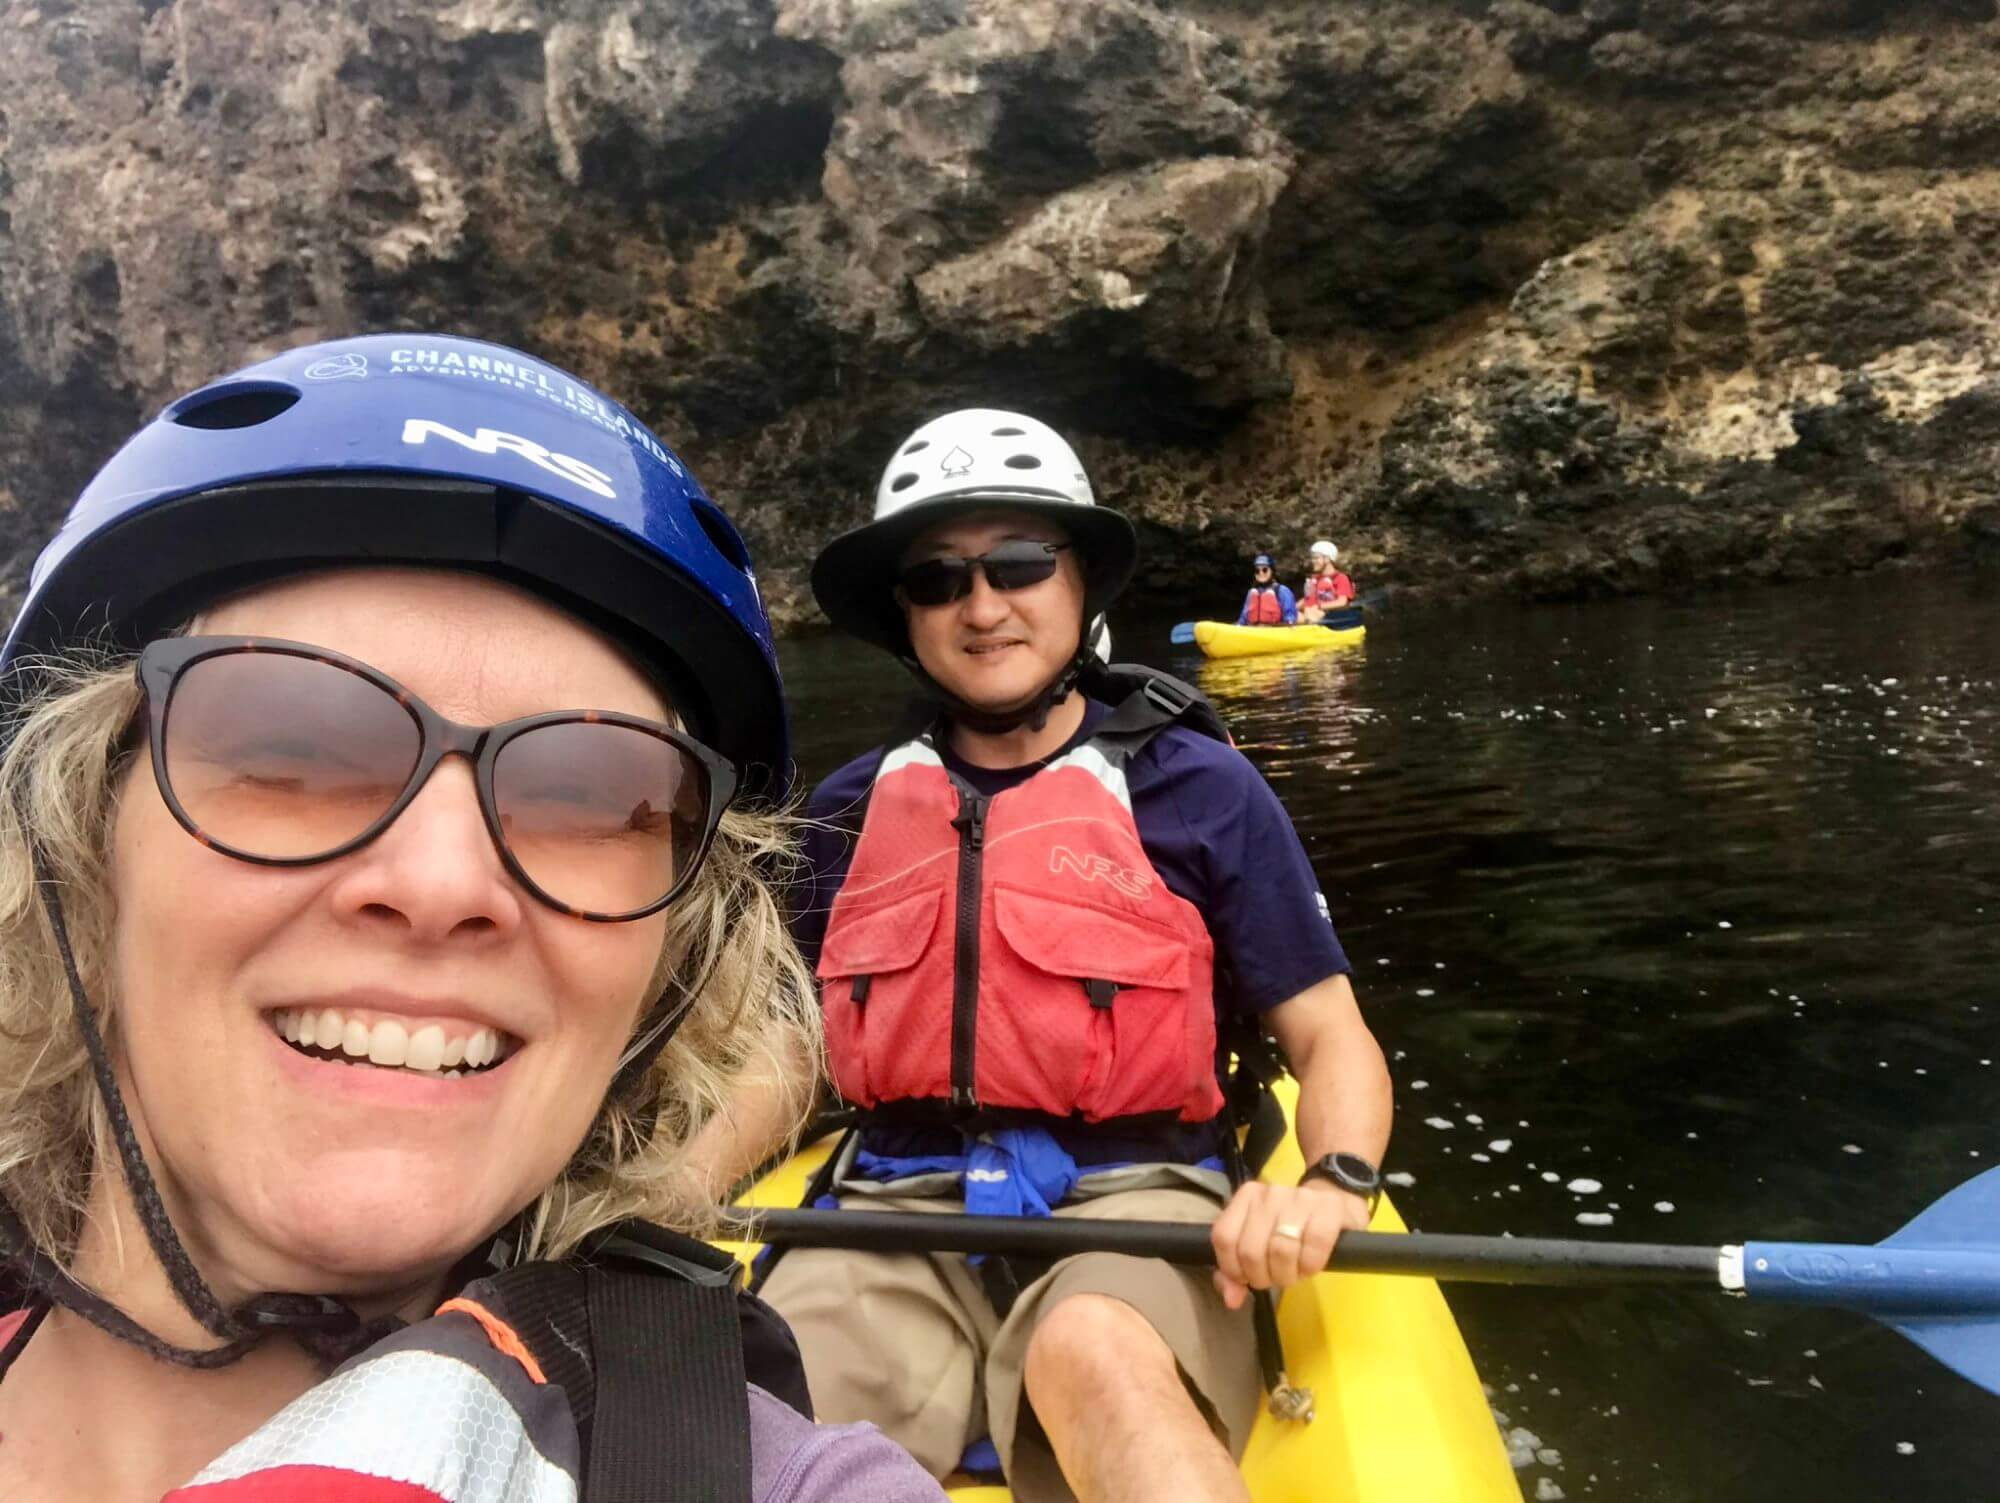 Wendy and Jason kayaking